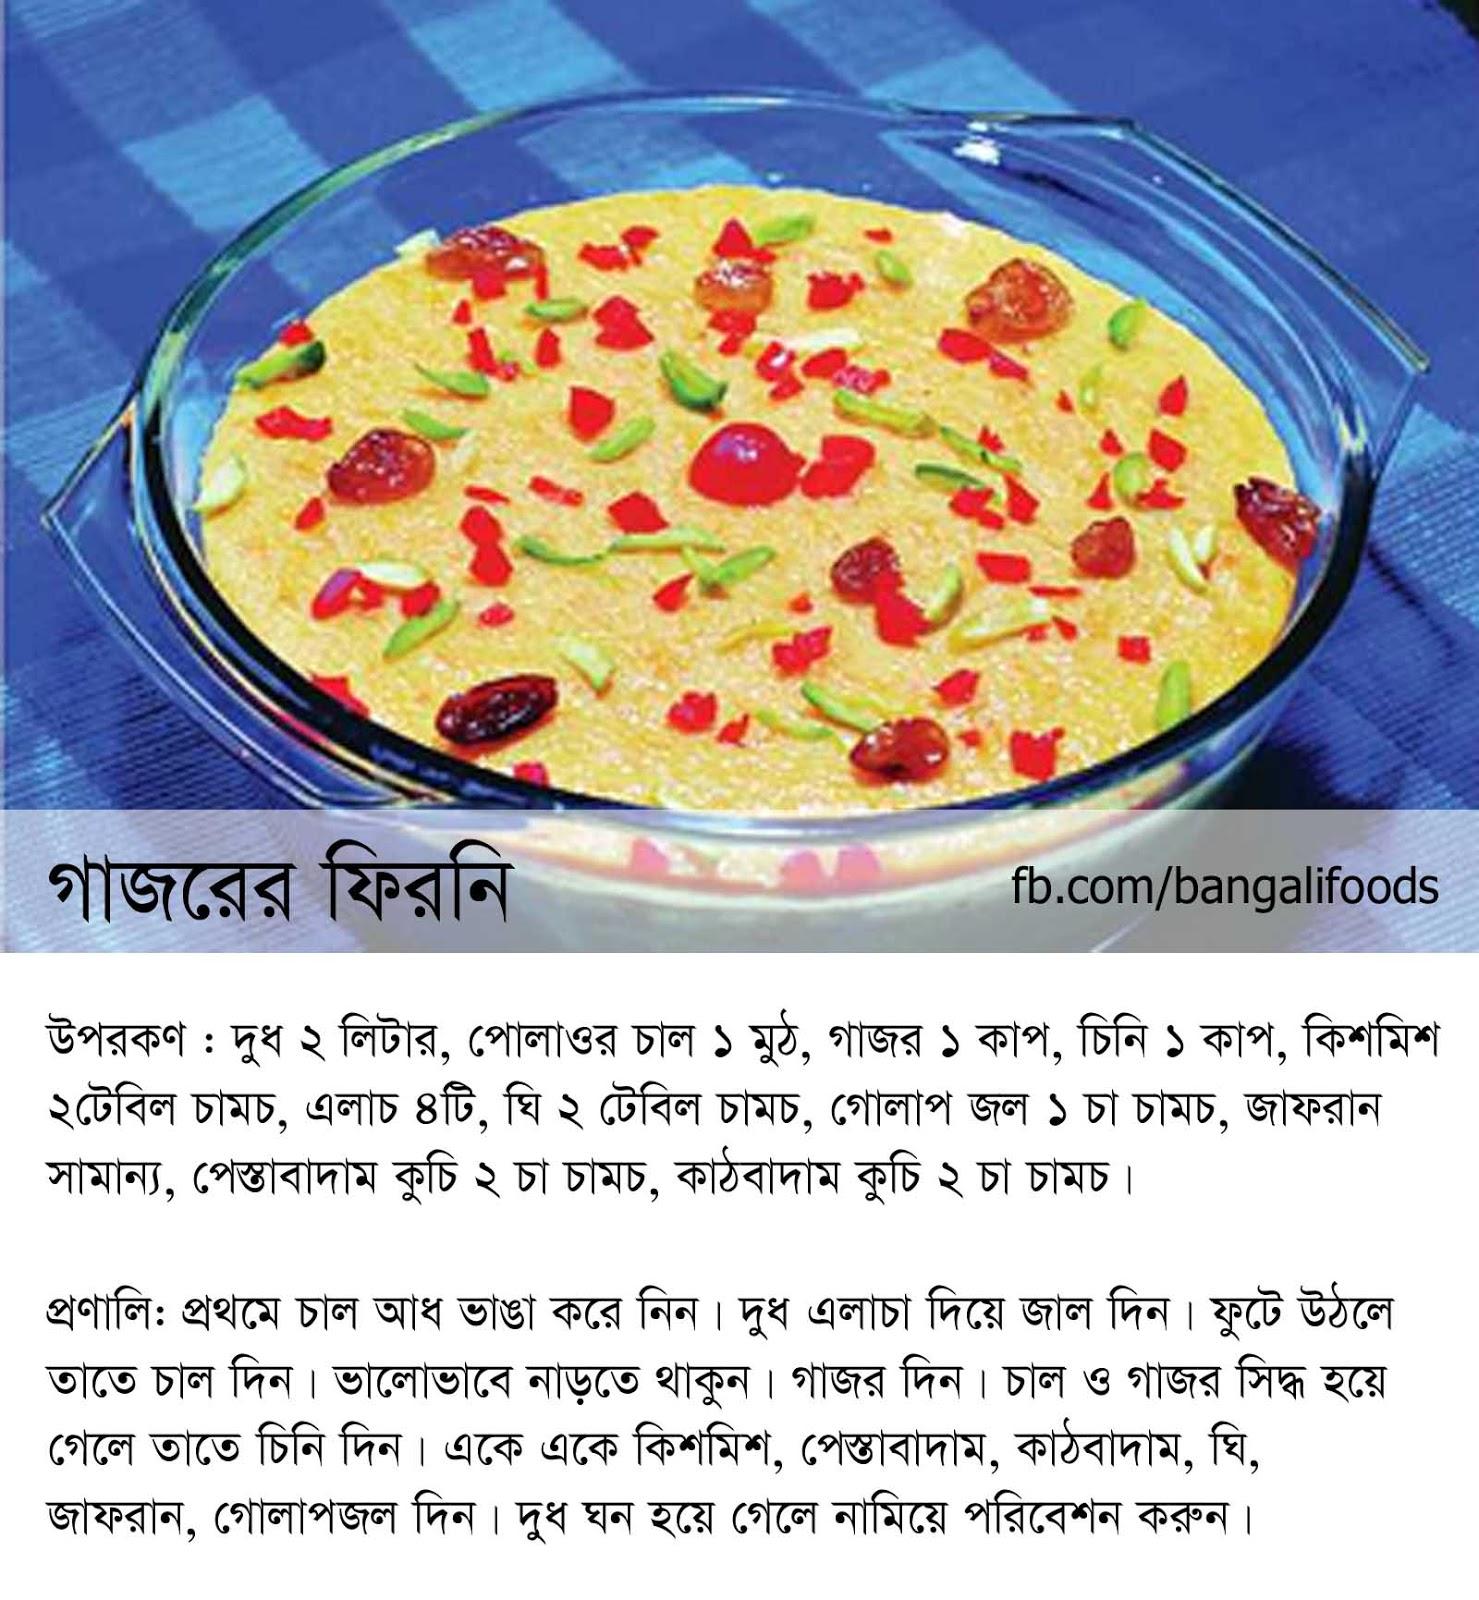 Chocolate cake recipe in bengali language bangladeshi recipe bangla bangali foods carrot item food recipe forumfinder Gallery